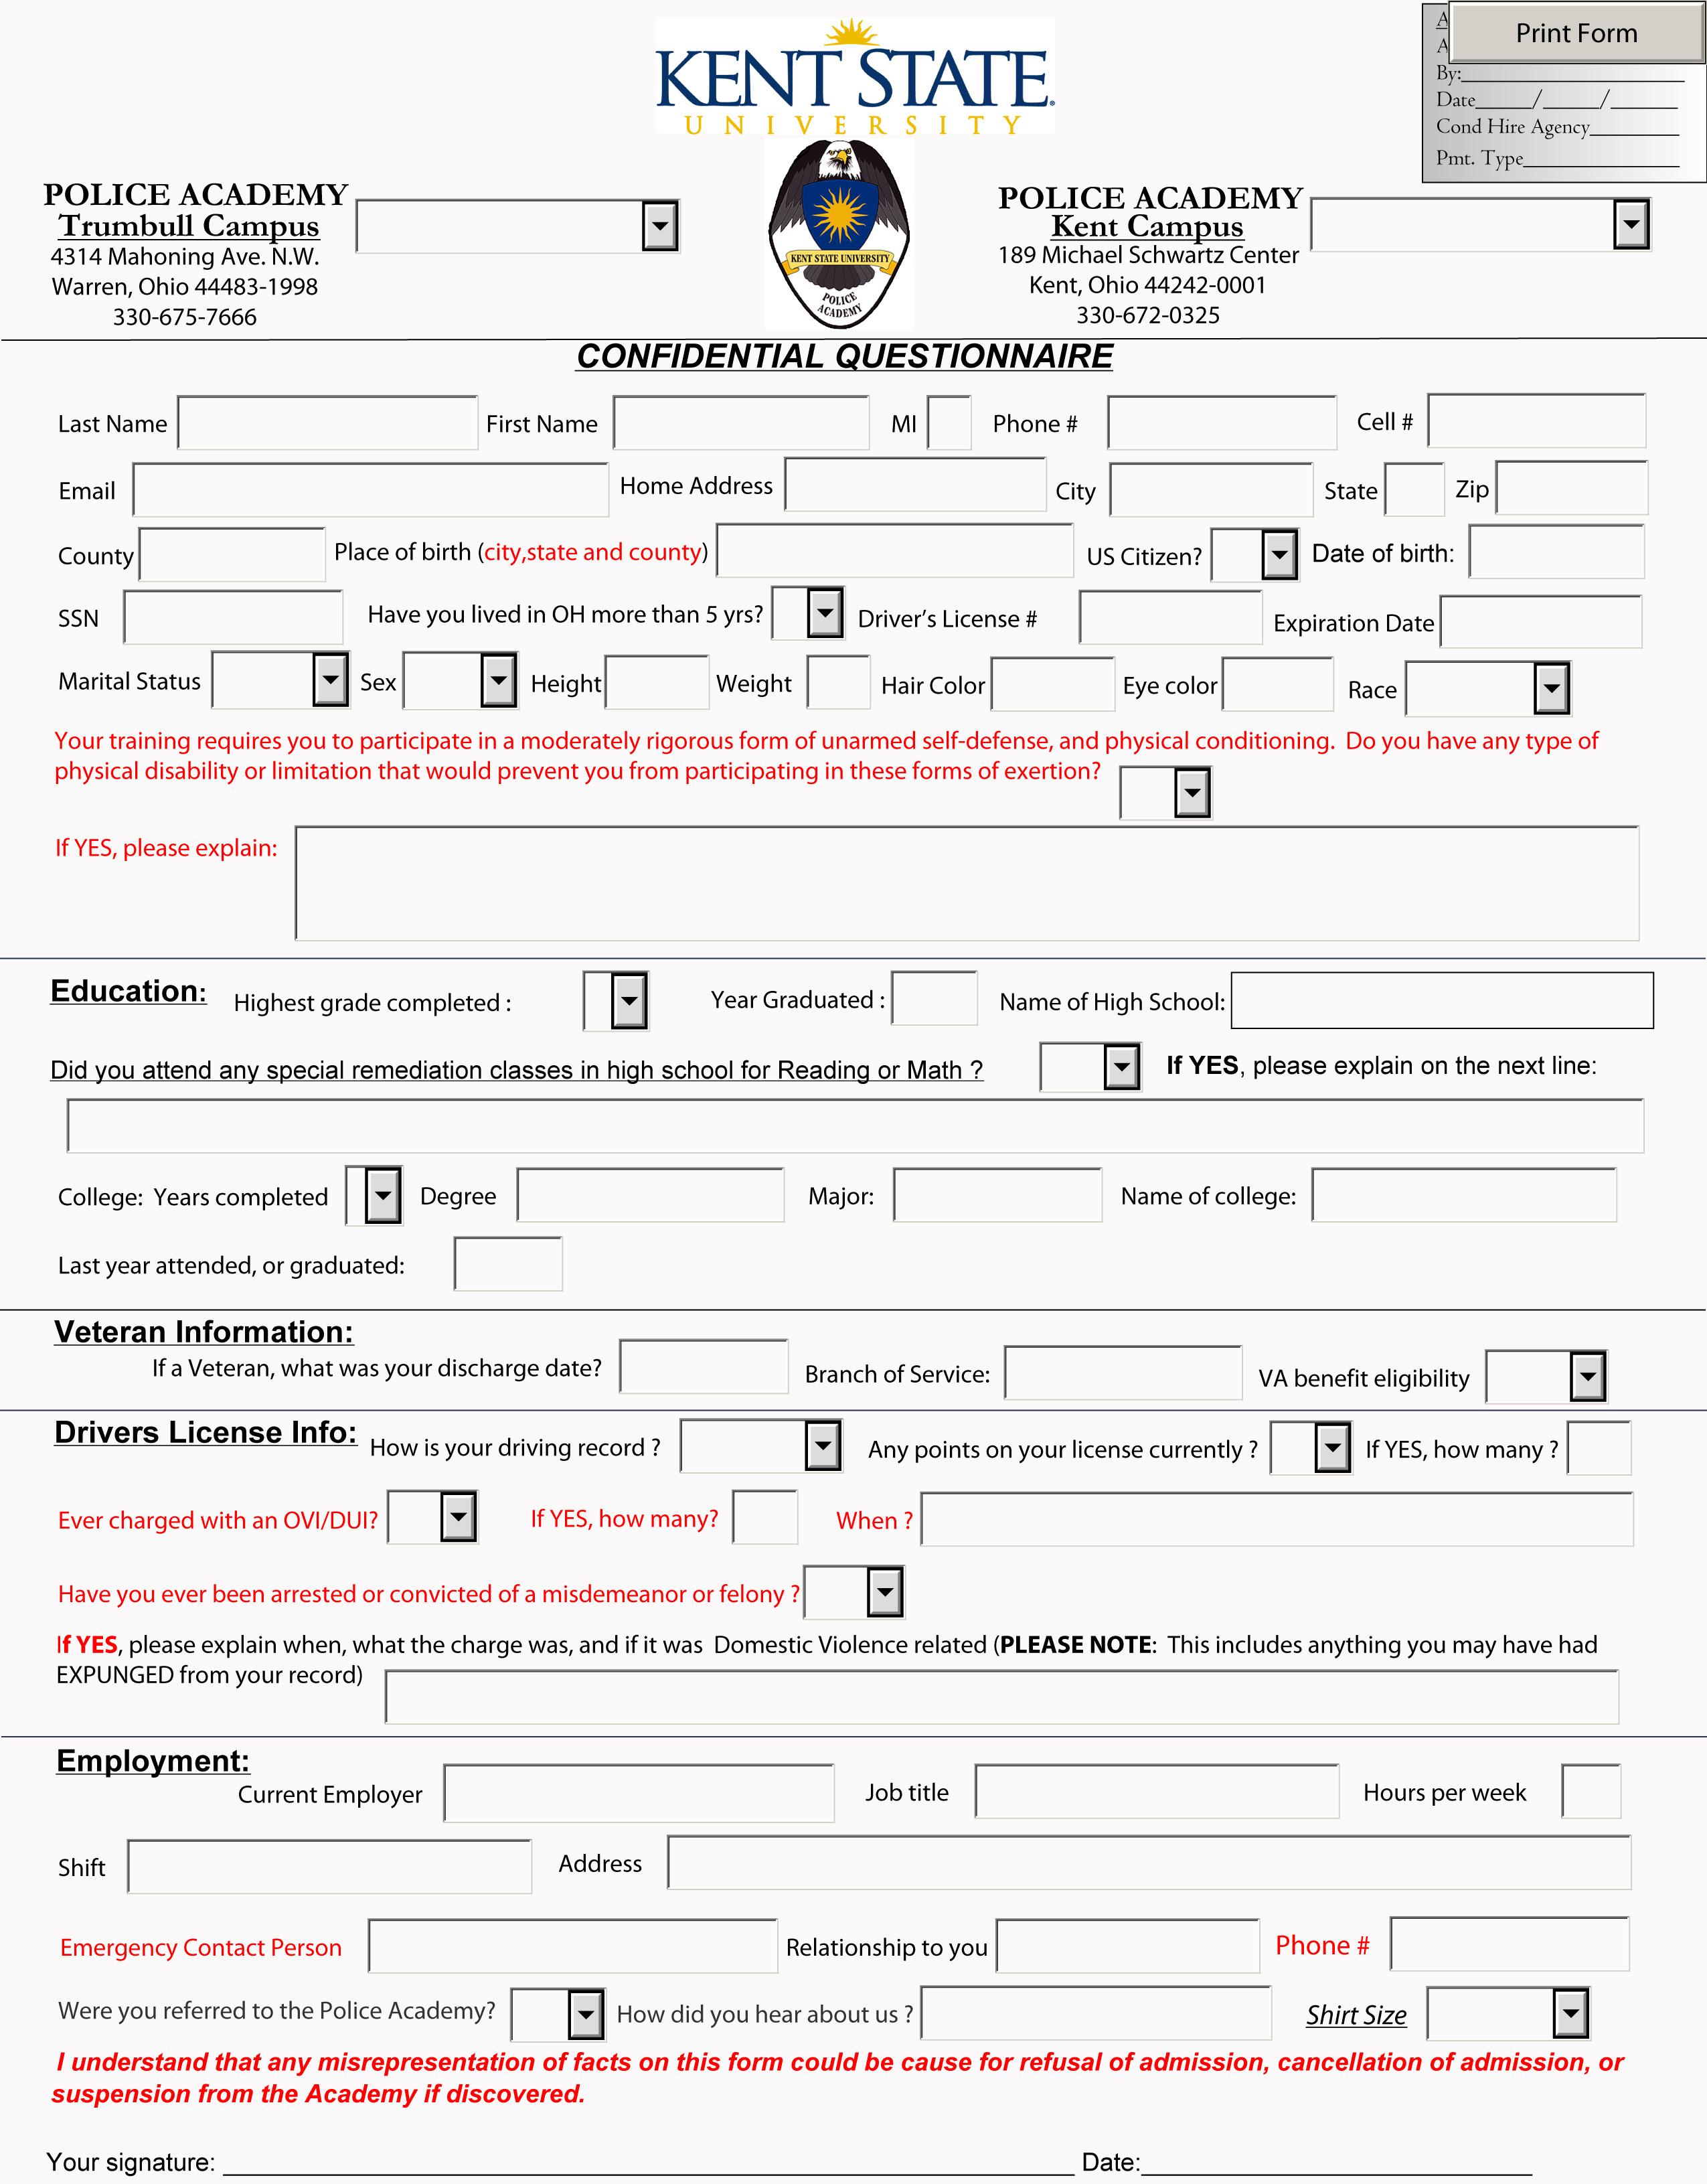 Police Academy Application